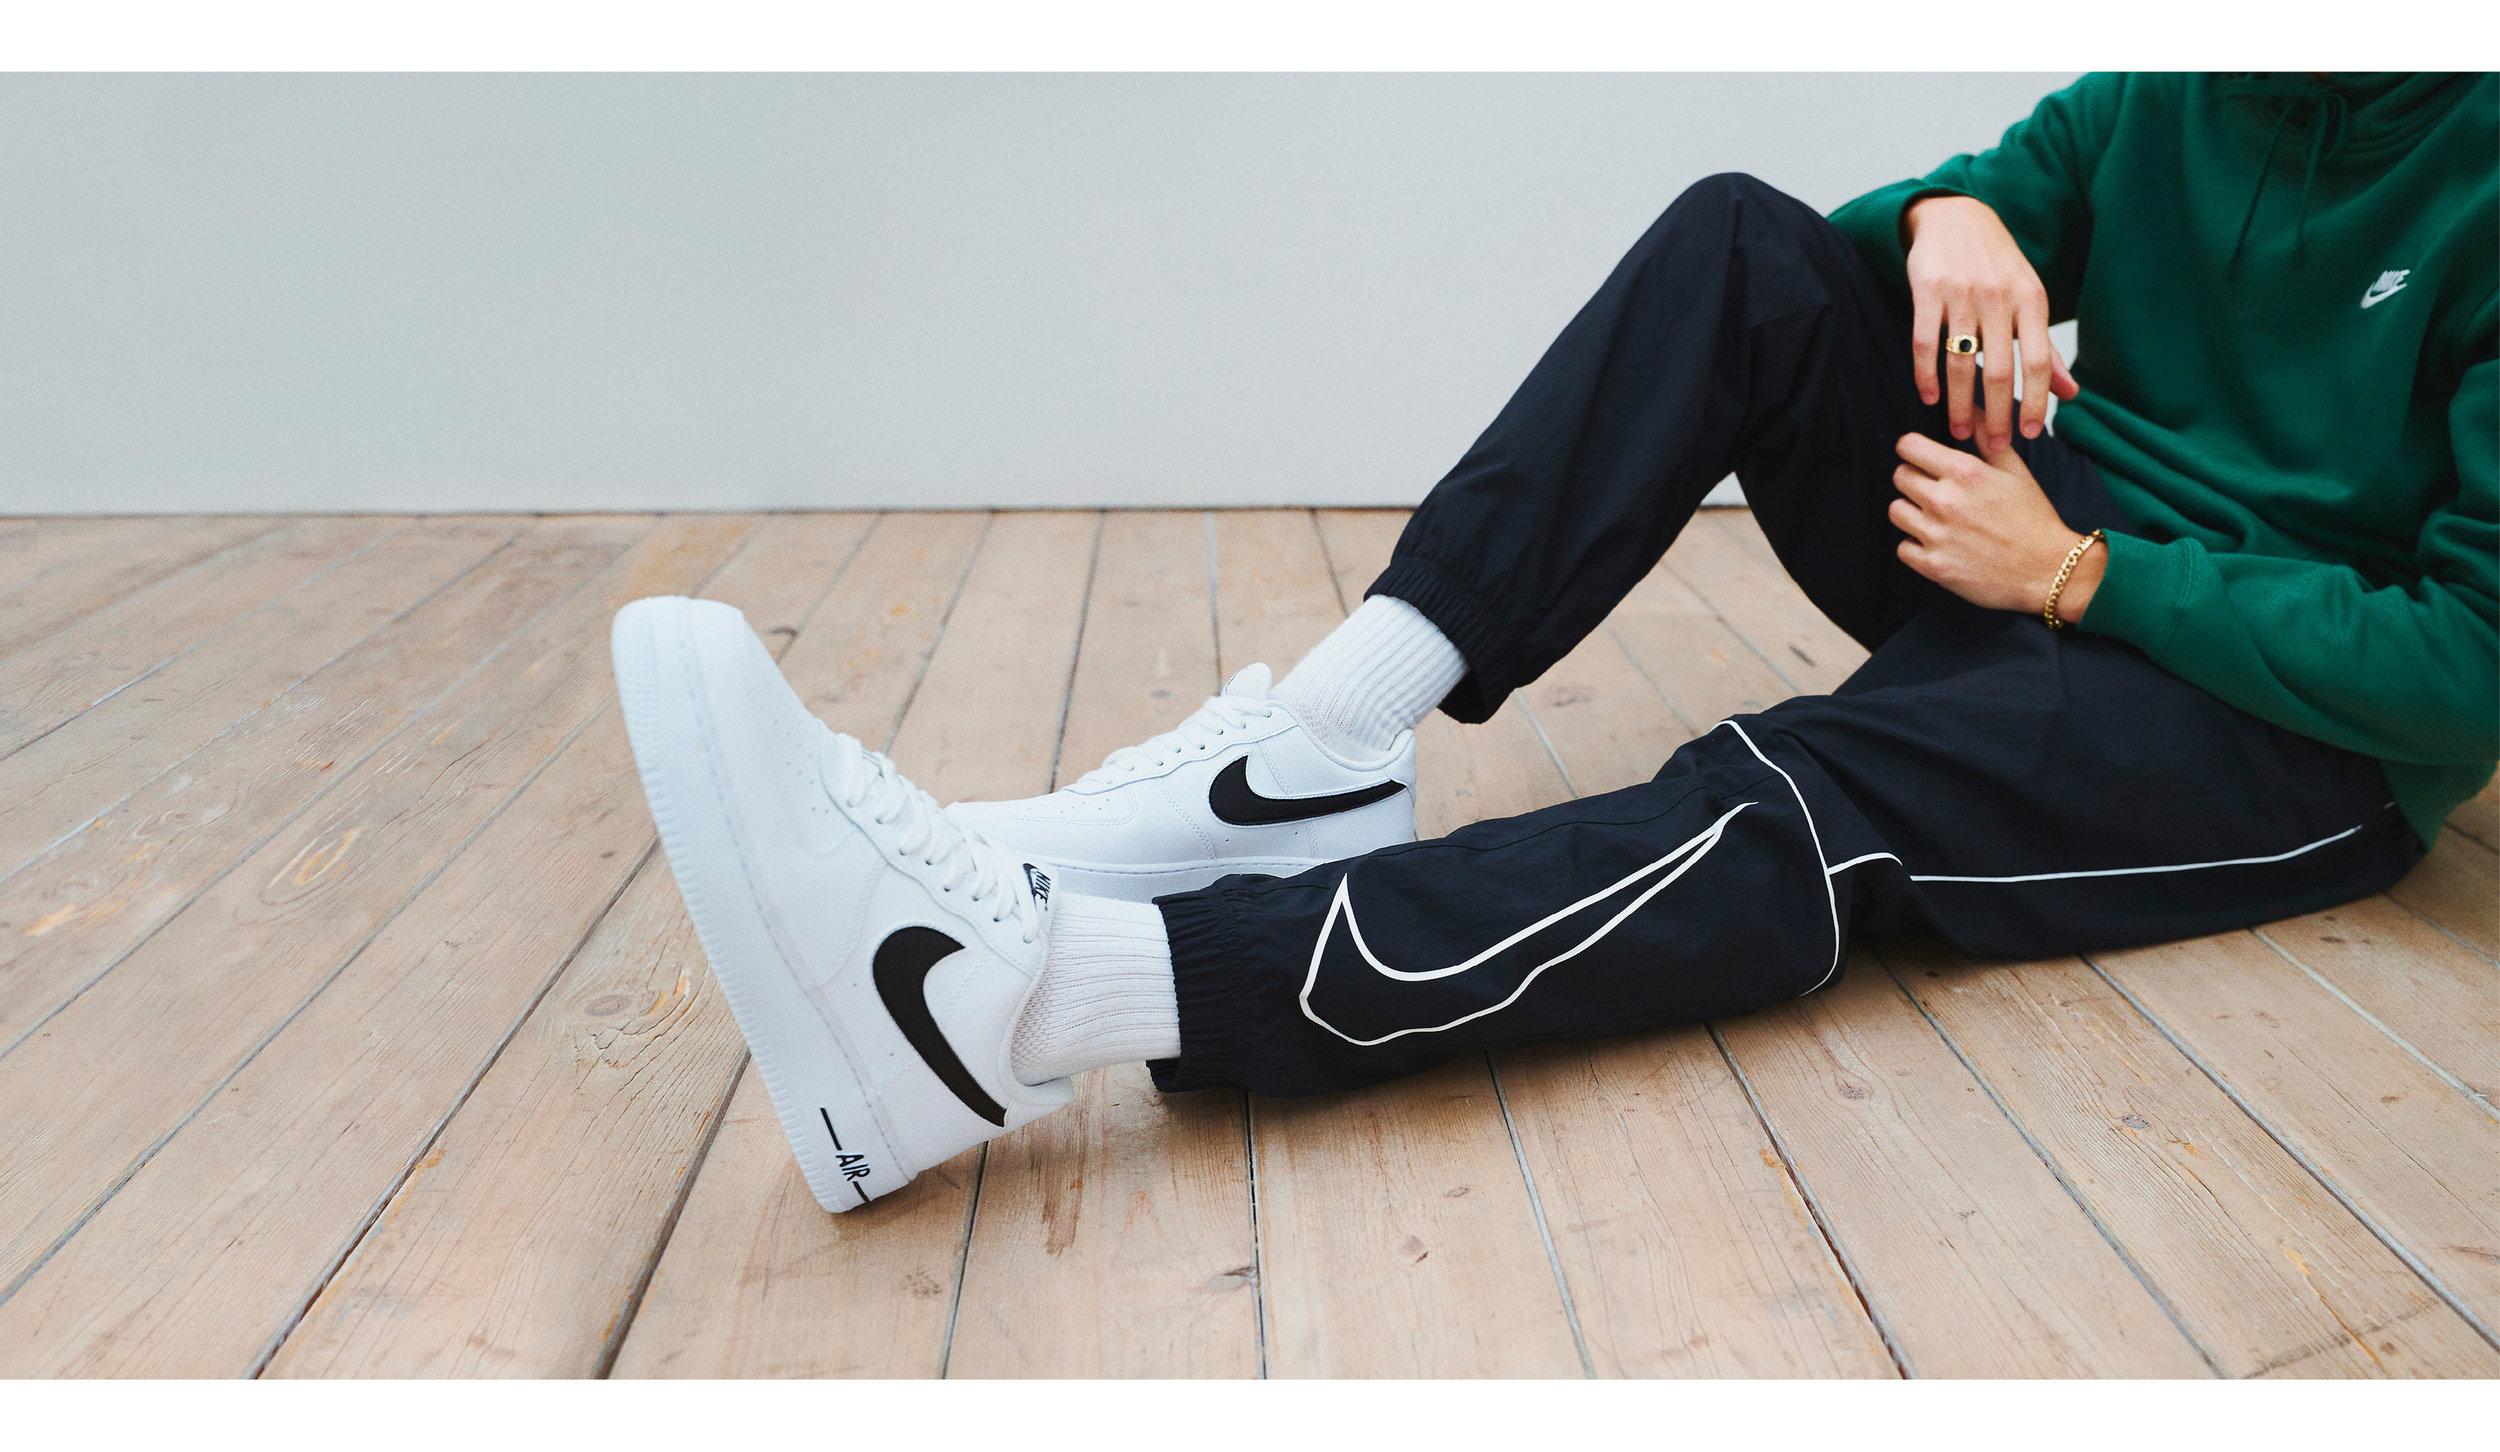 JWDTAN_Nike_WTWTW_6.jpg